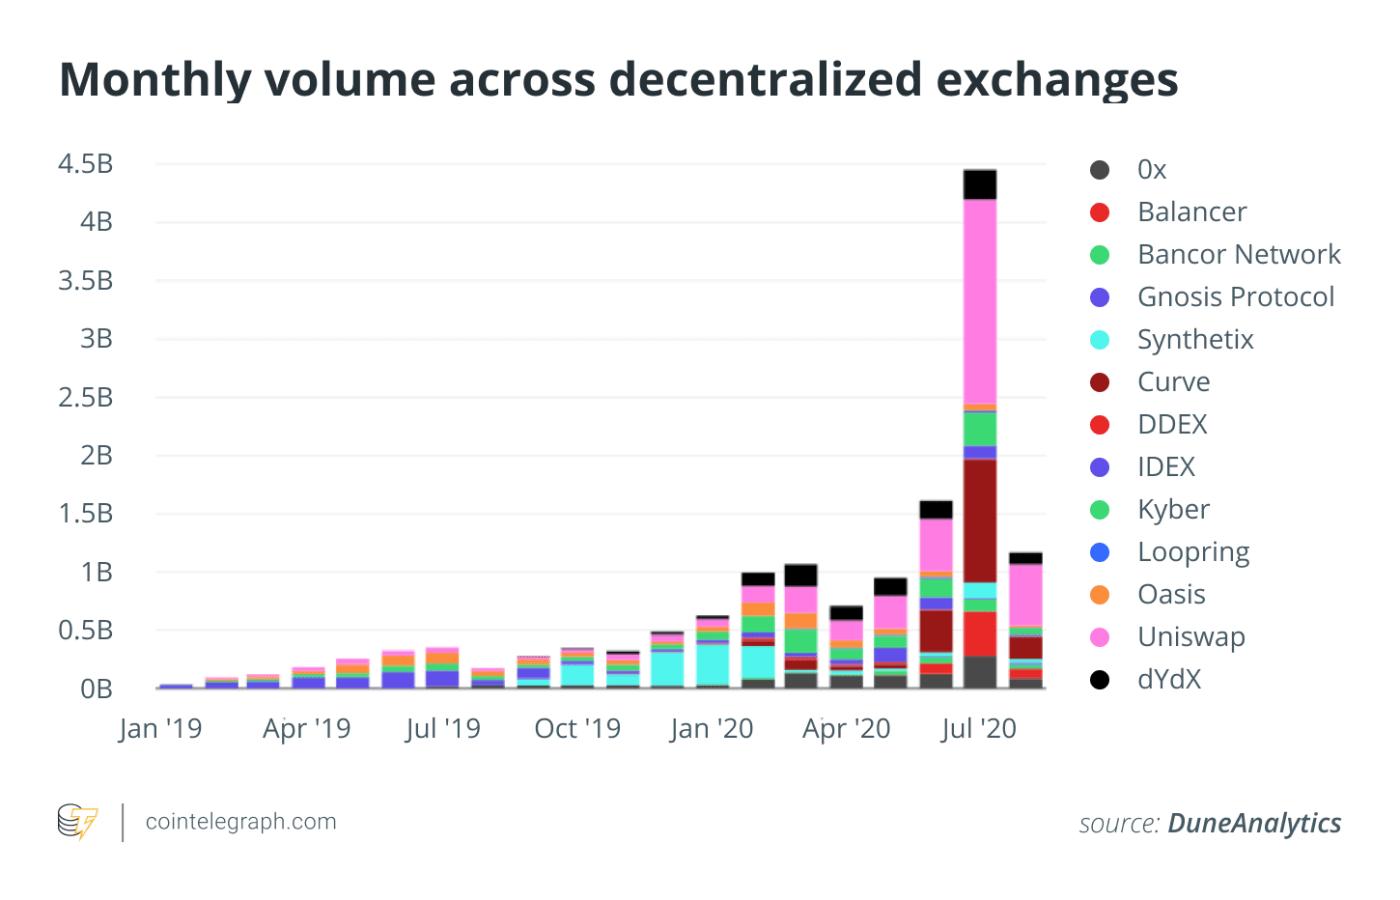 Monthly volume across decentralized exchanges